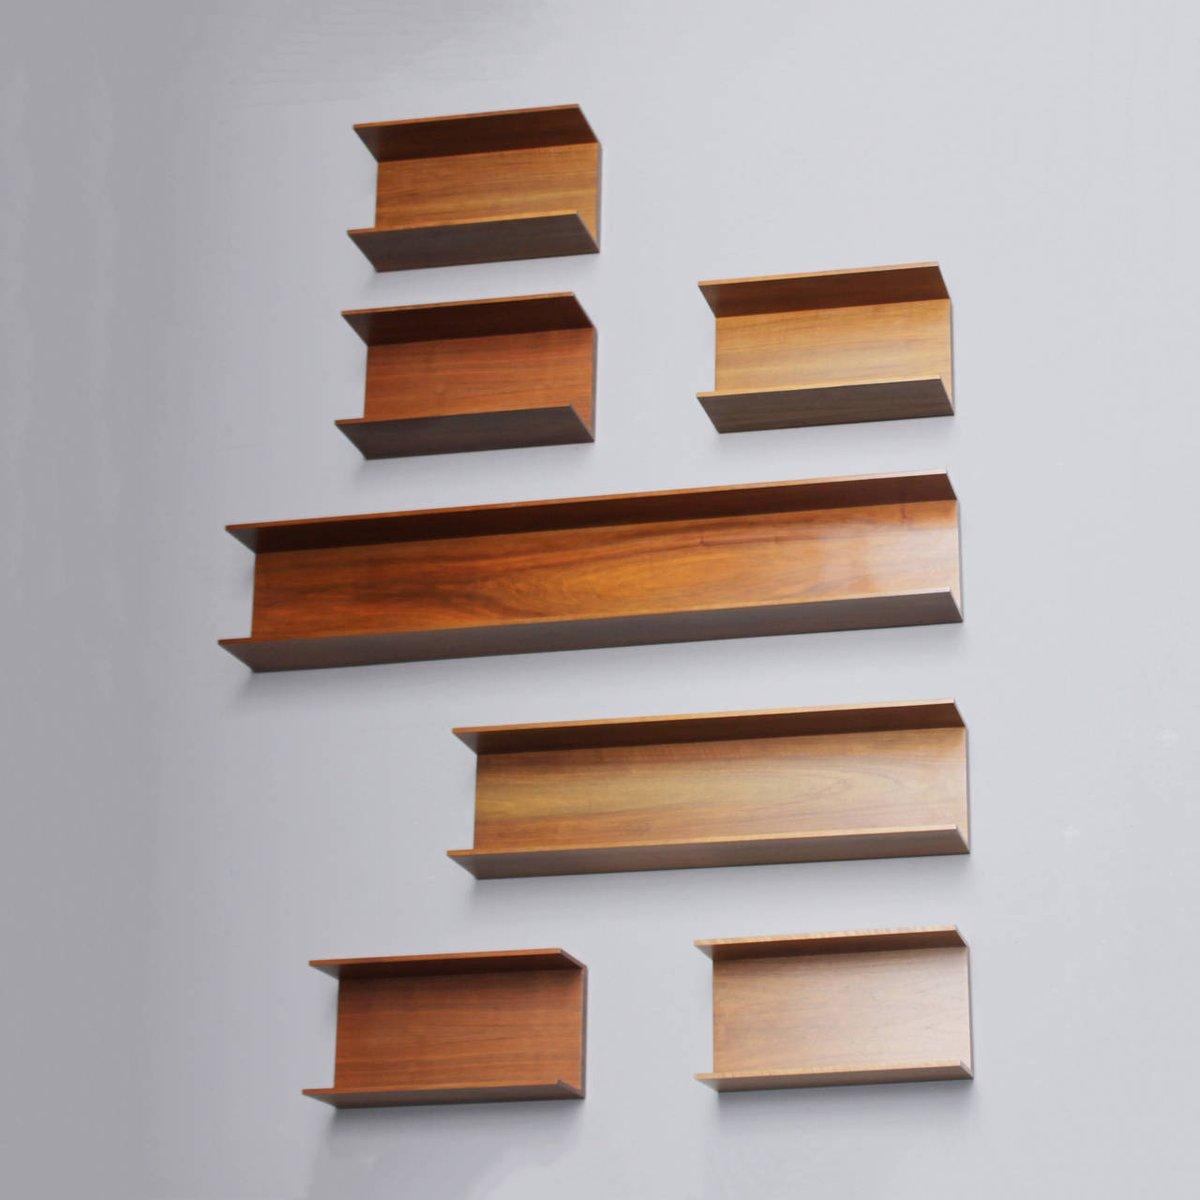 walnut wall shelves by wilhelm renz  1960s  set of 7 for walnut cube wall shelves walnut wall shelves with metal brackets